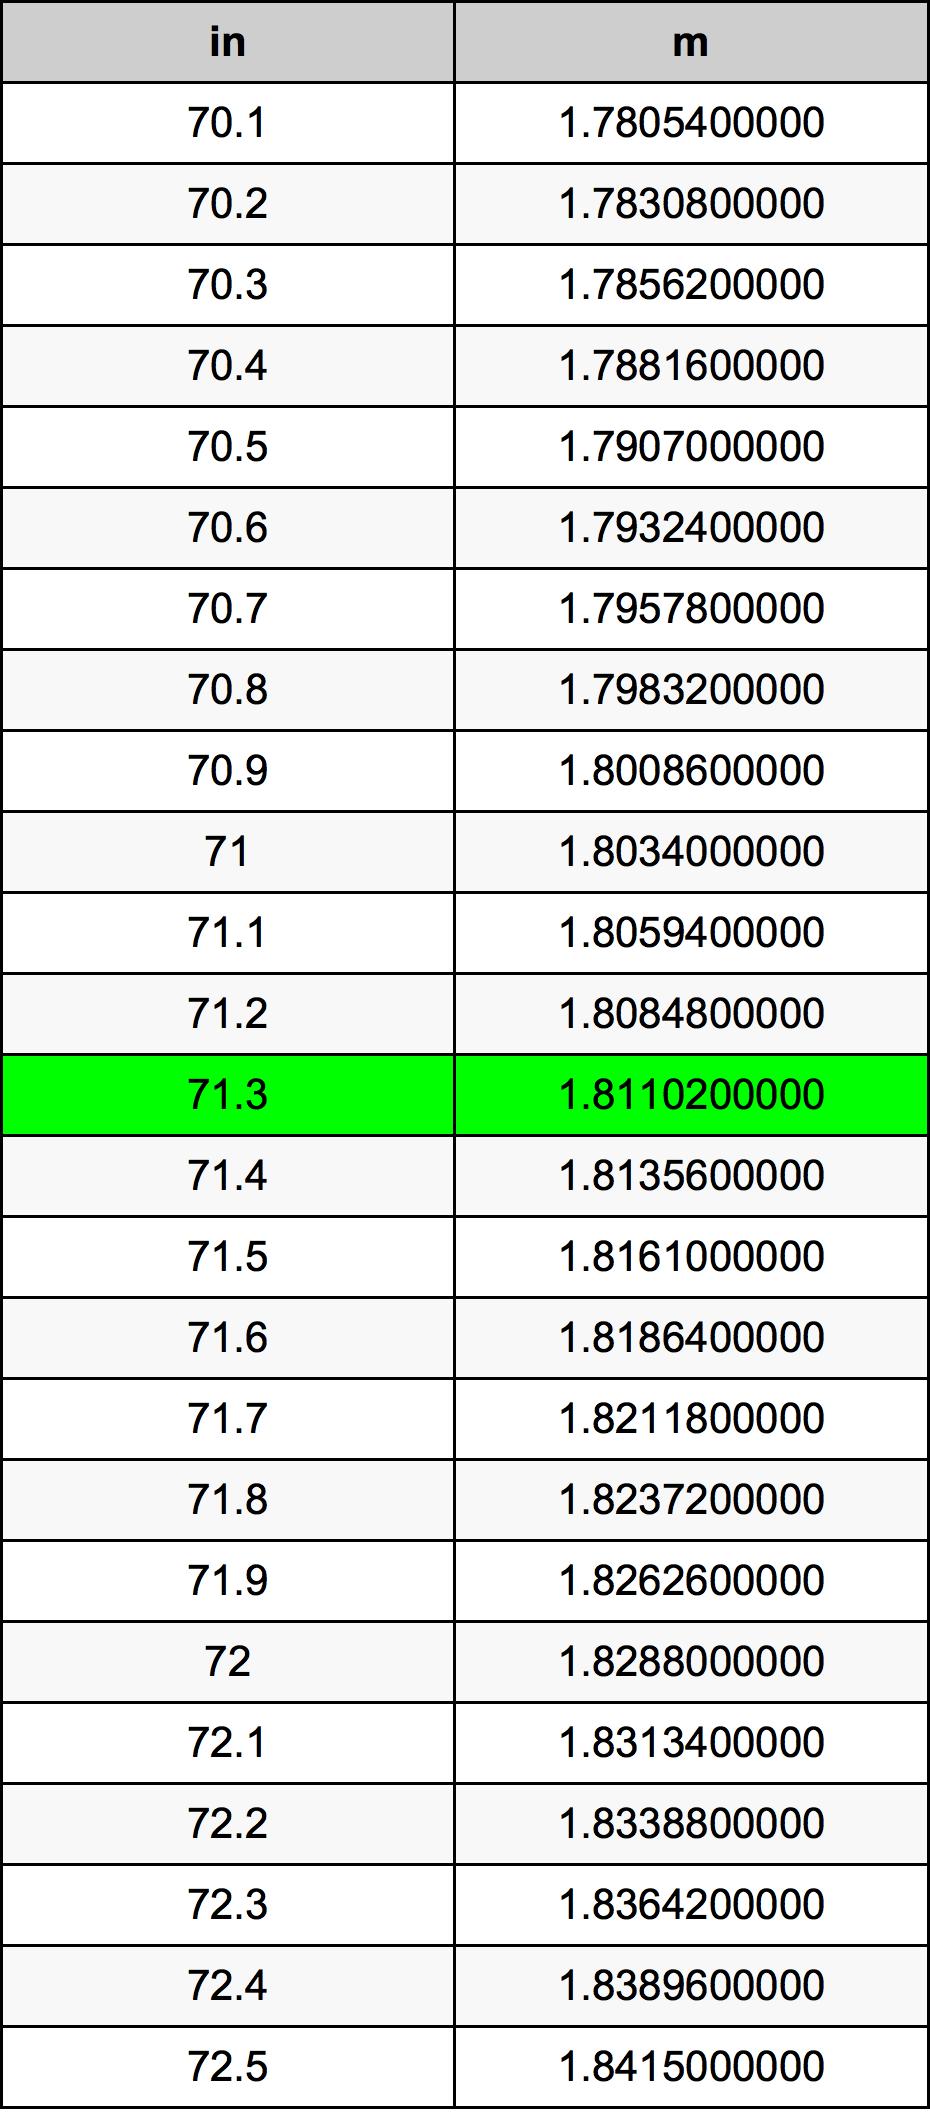 71.3 Inch konverteringstabell